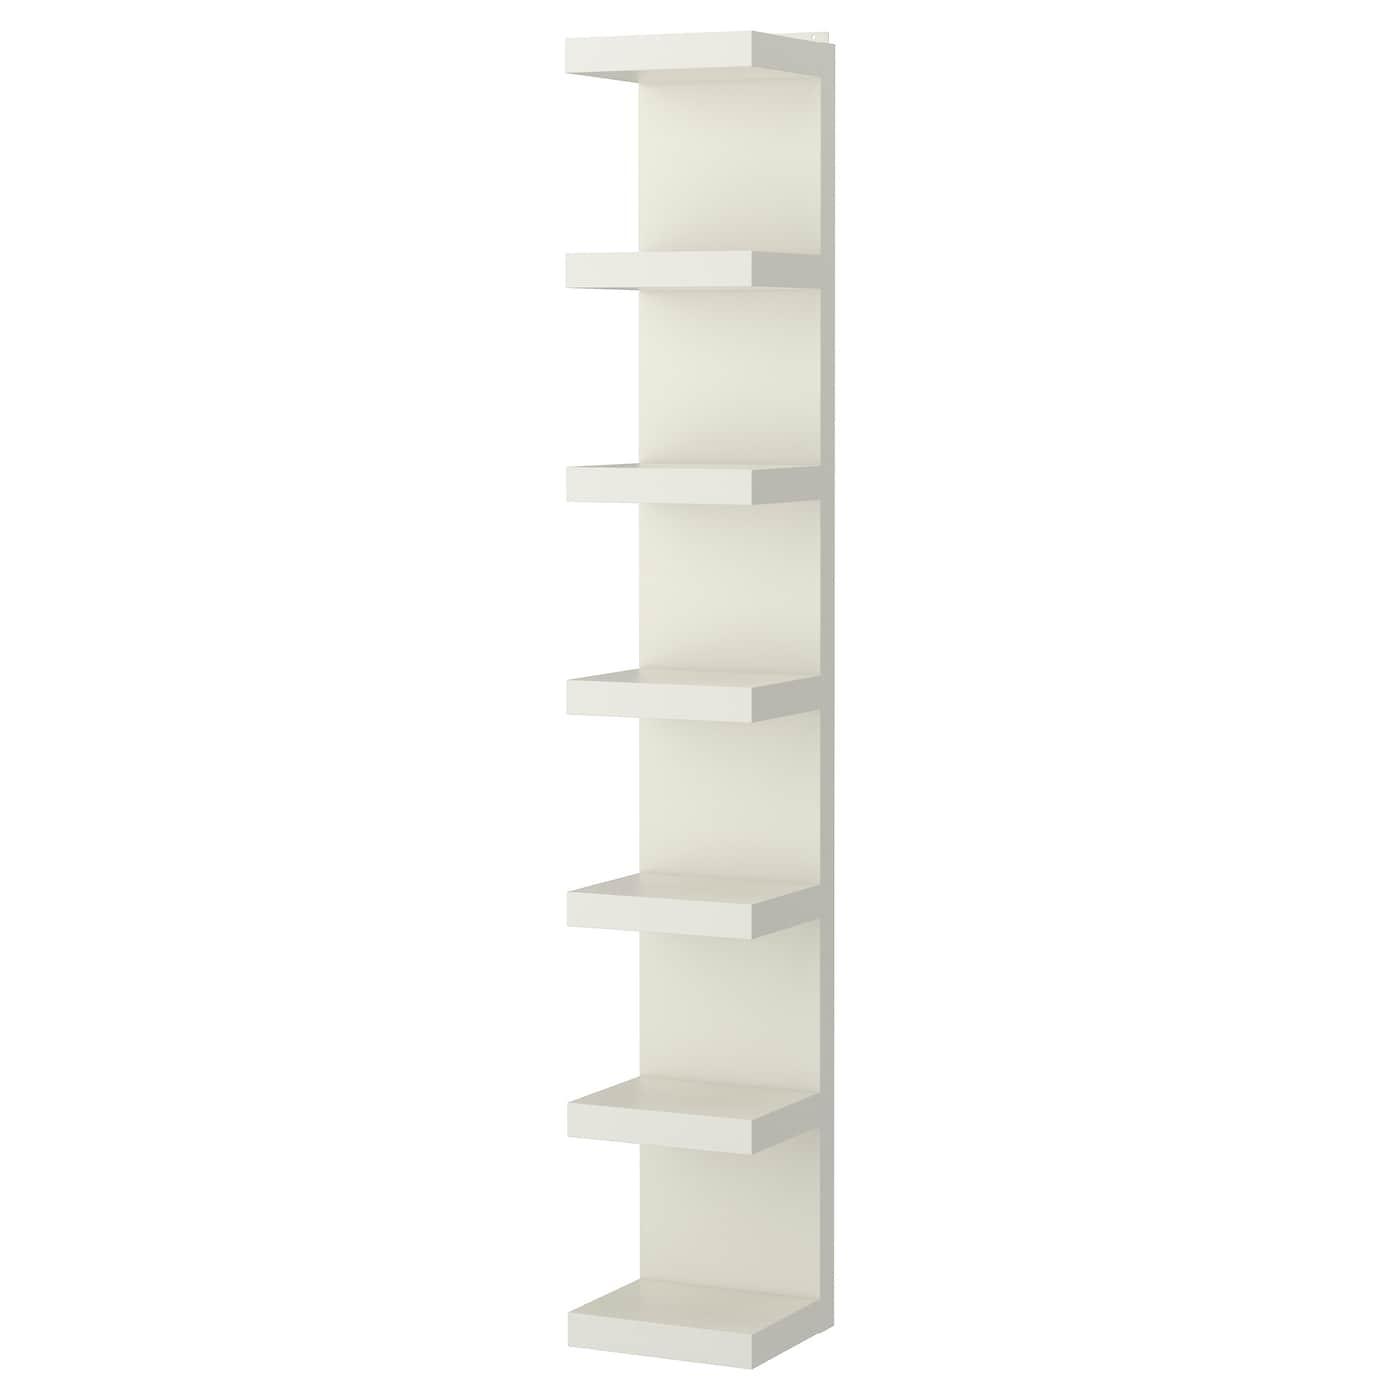 lack wall shelf unit white 30 x 190 cm ikea. Black Bedroom Furniture Sets. Home Design Ideas